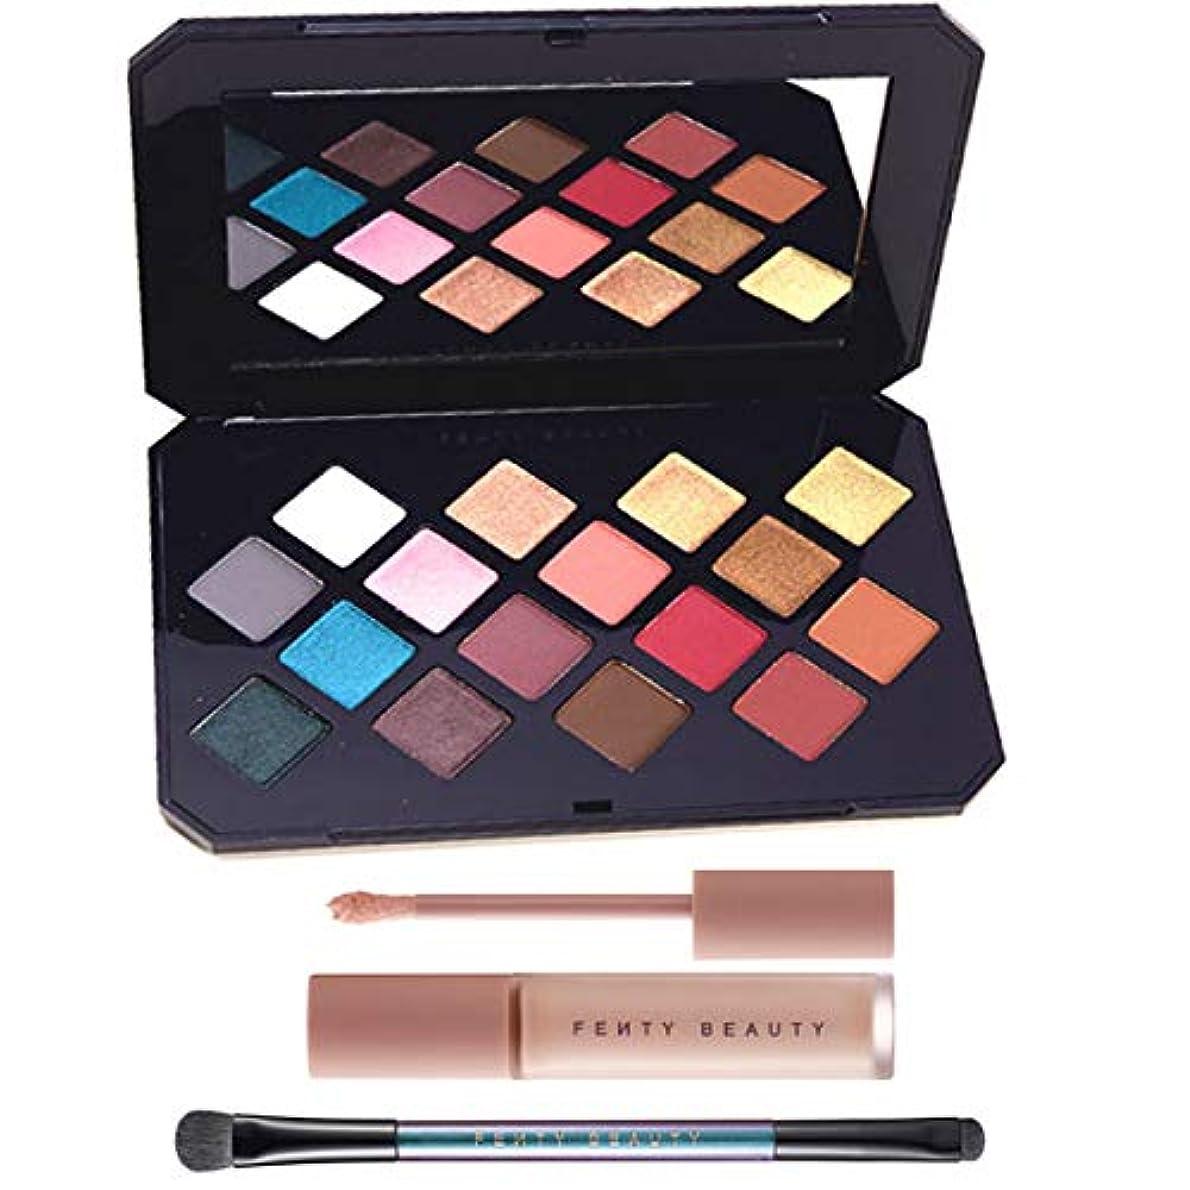 主人開業医苦情文句FENTY BEAUTY BY RIHANNA, Moroccan Spice Eyeshadow Palette & Eye Essentials [海外直送品] [並行輸入品]